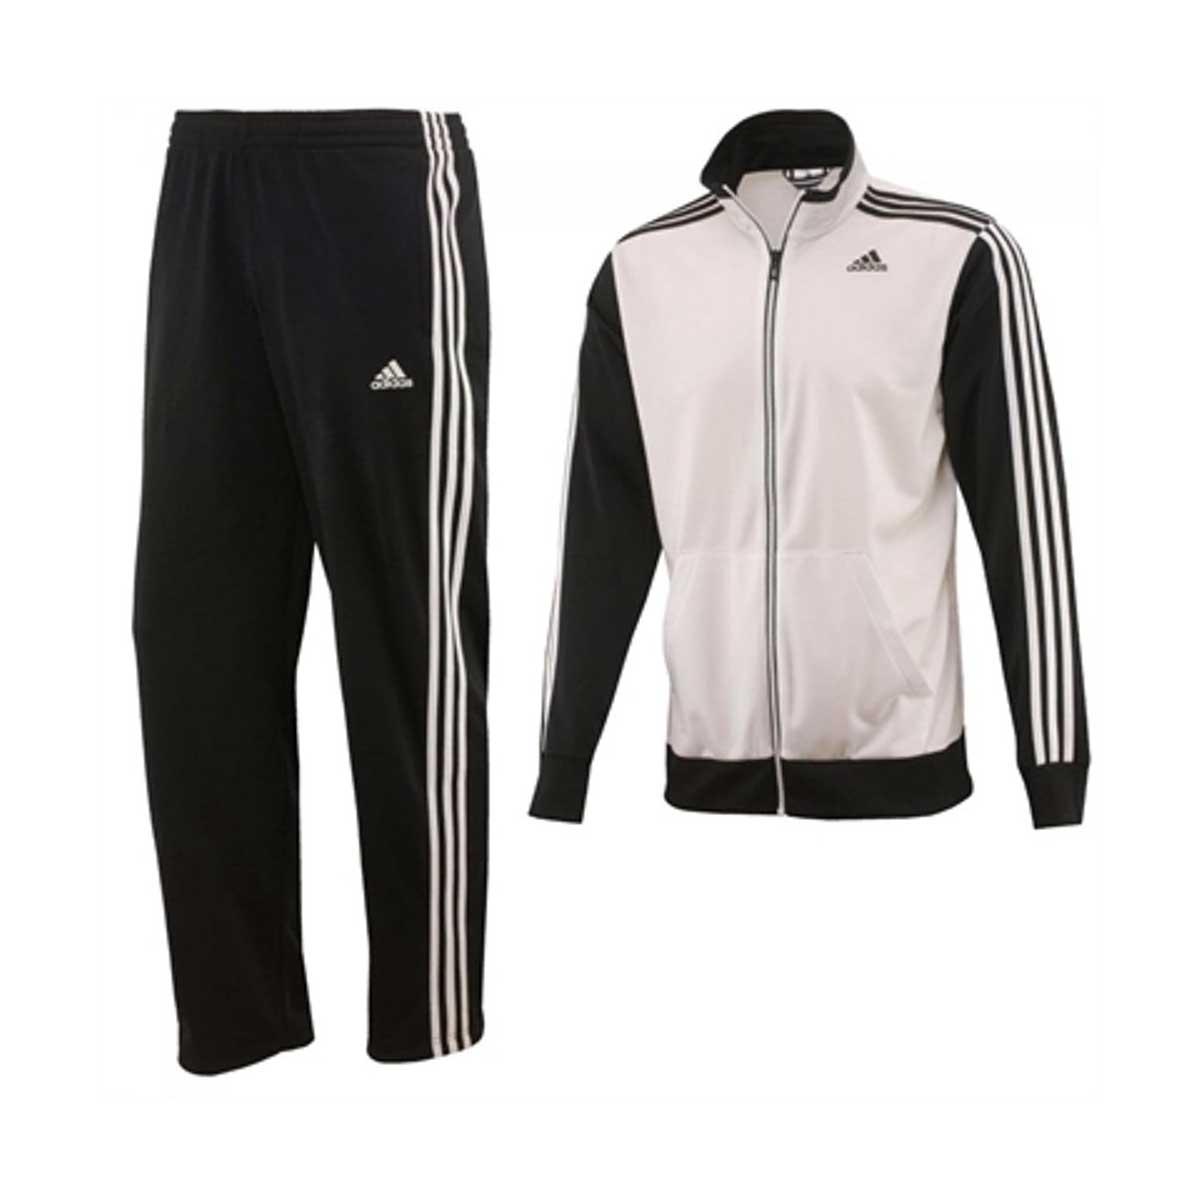 7884b4b4b Buy Adidas Mens Riberio Tracksuit (White/Black) Online India